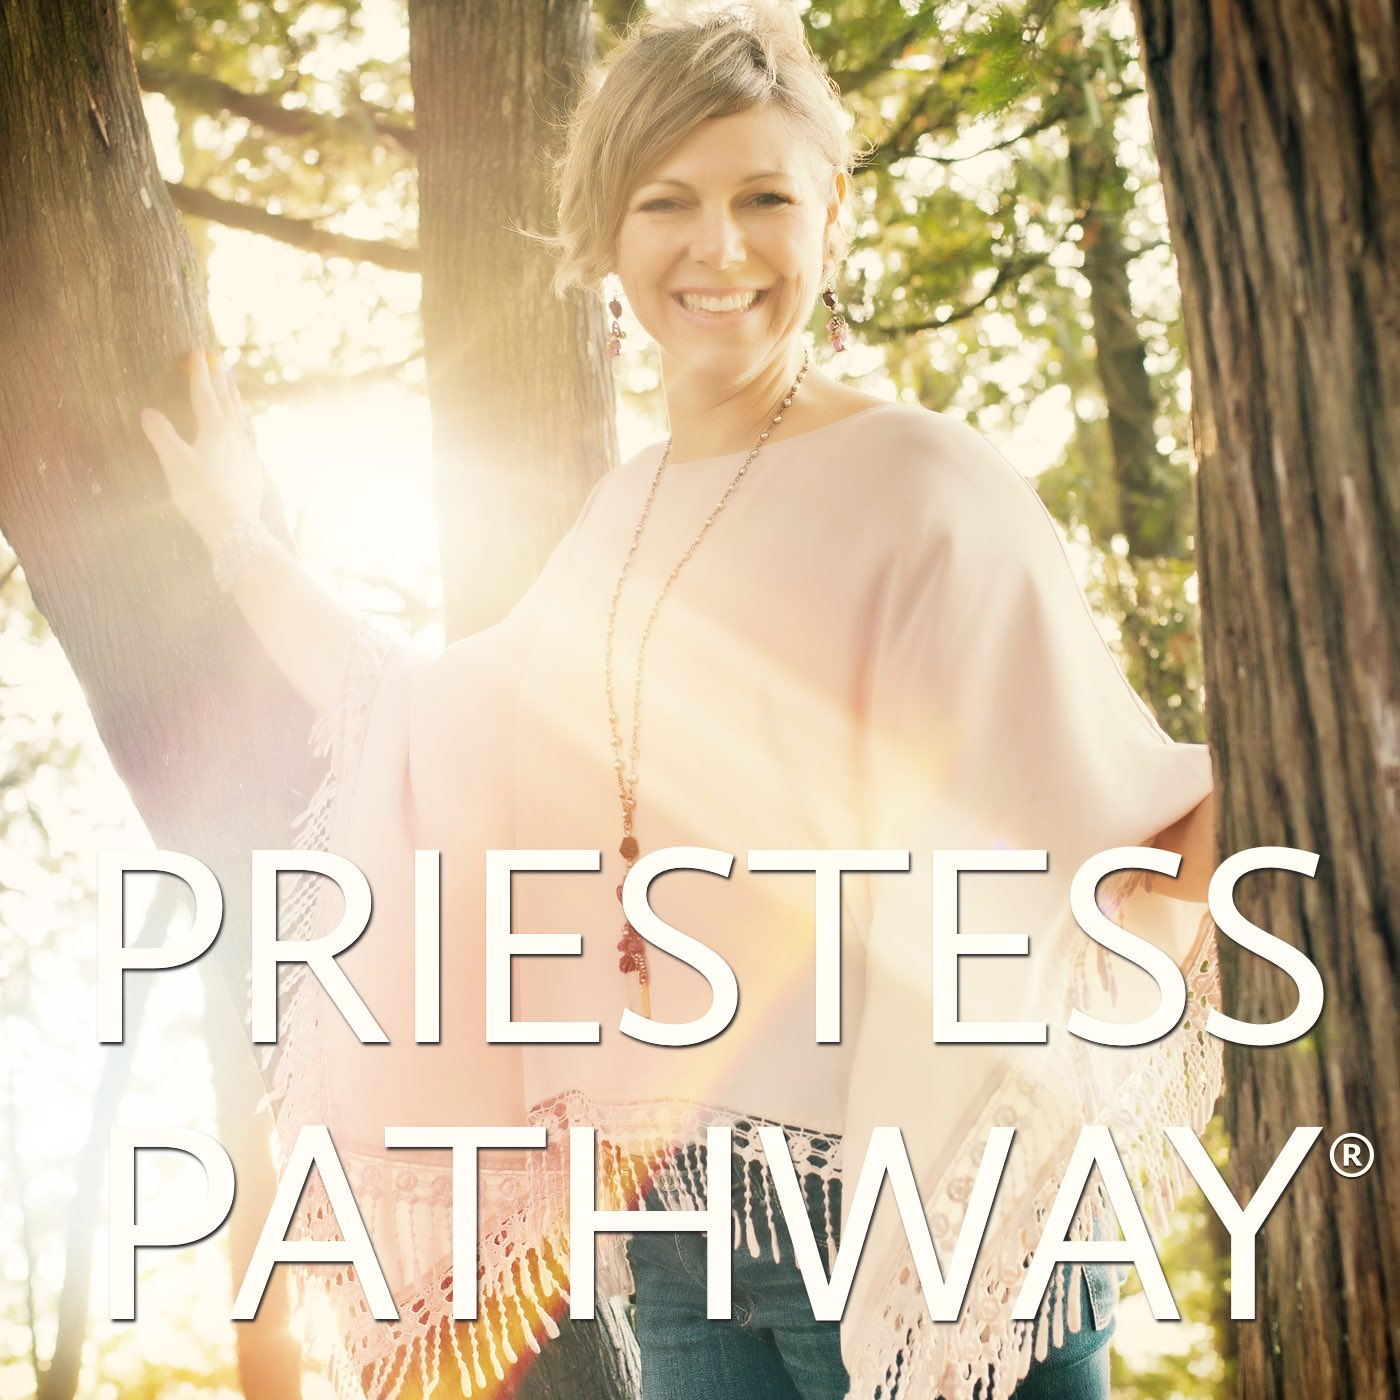 Priestess Pathway Podcast